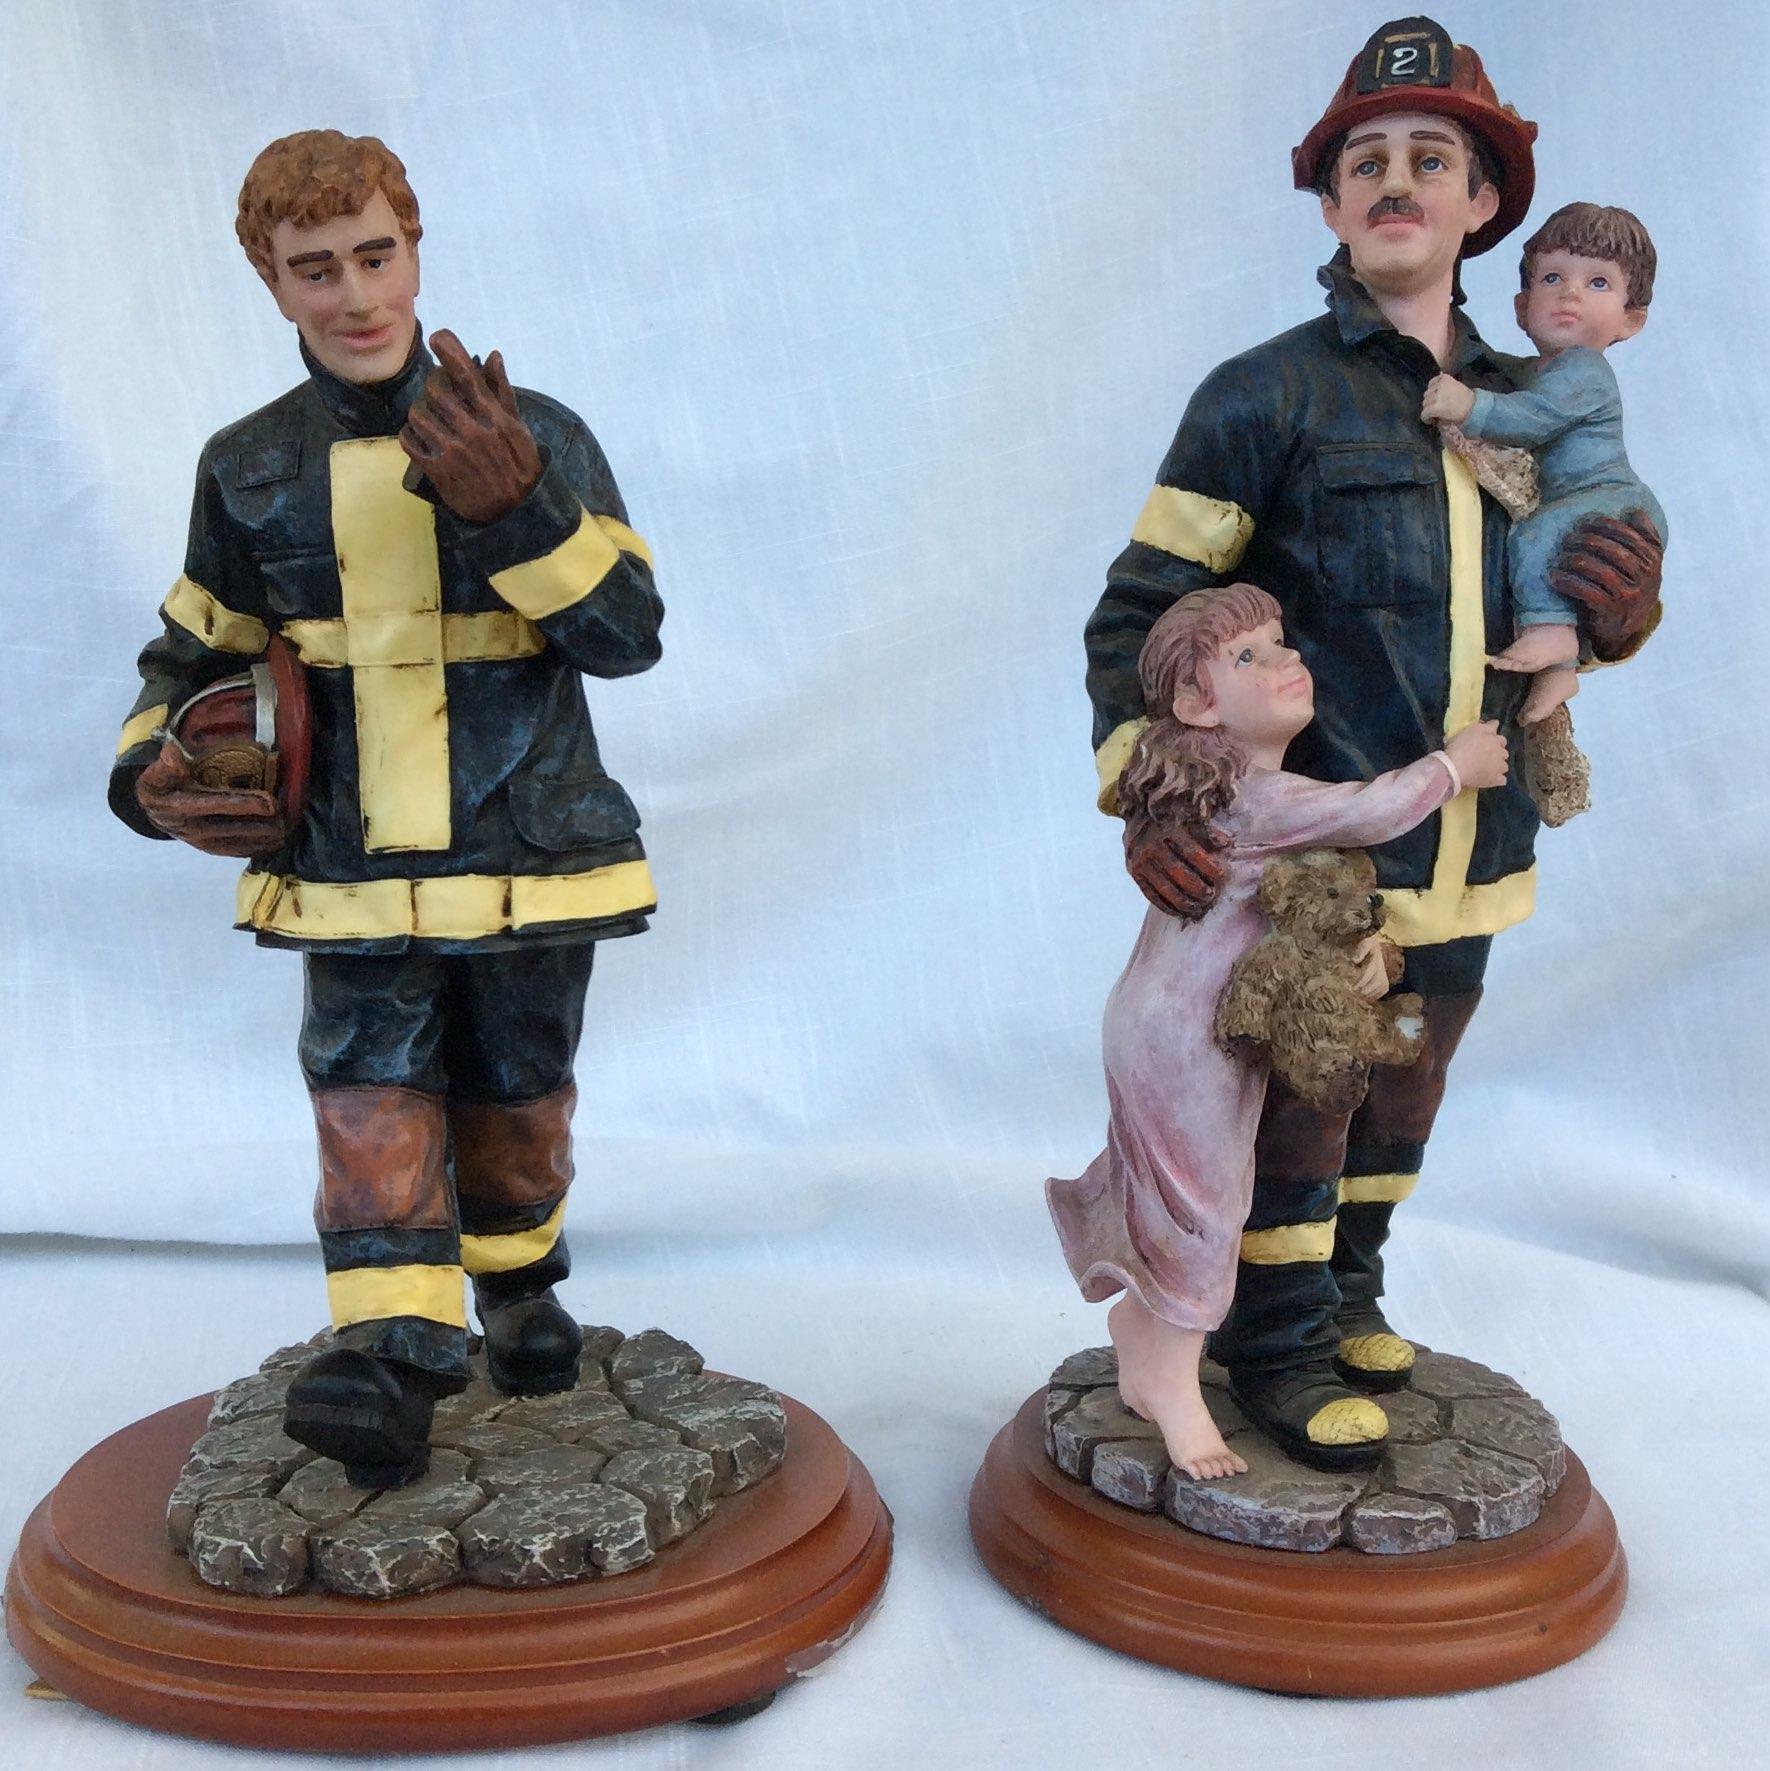 Firemen Redhats of Courage